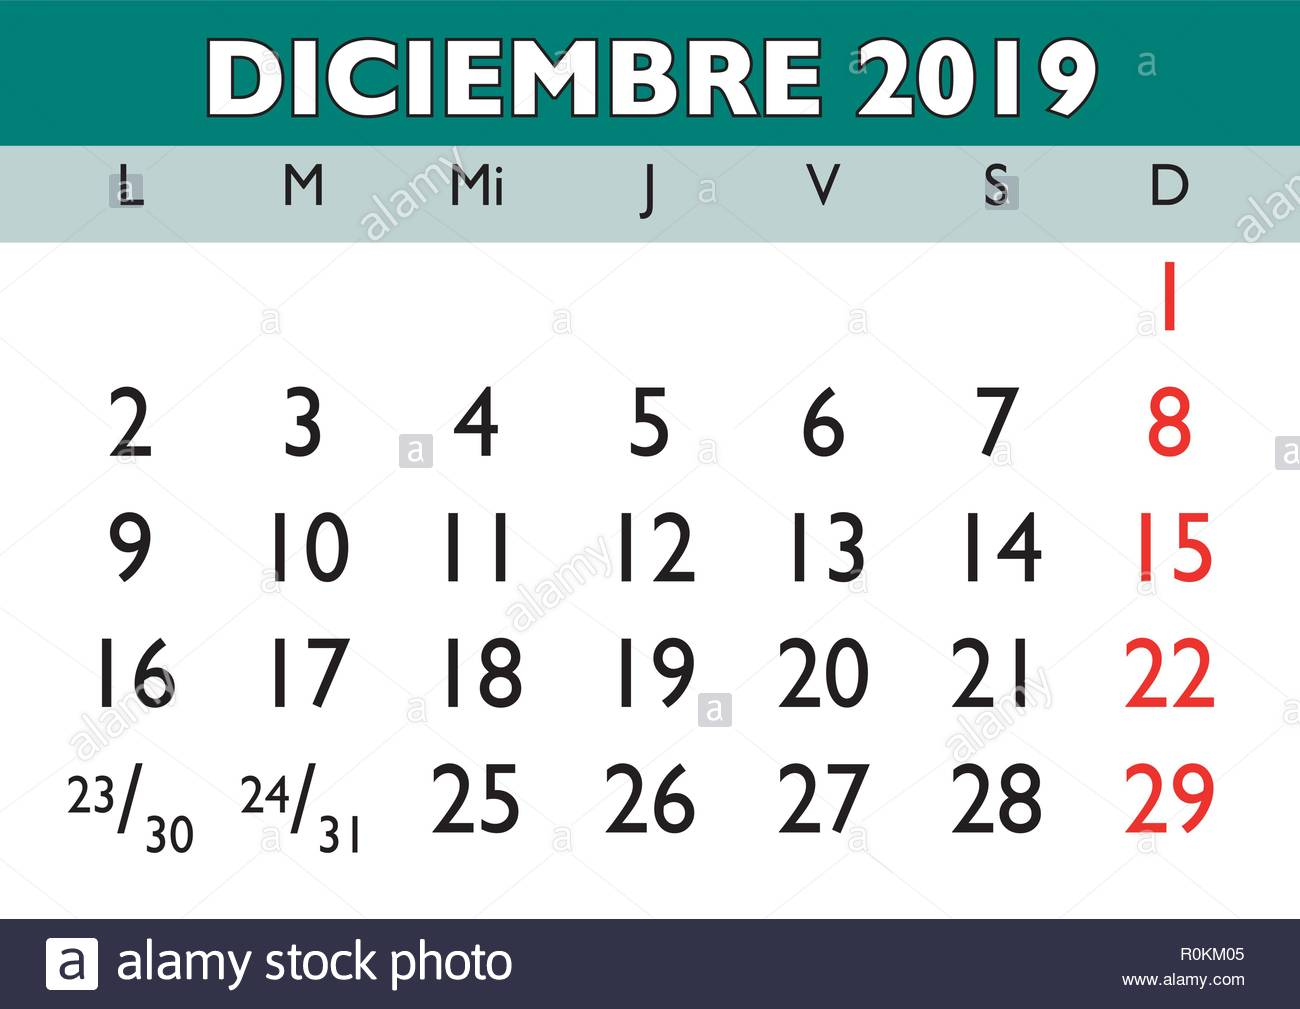 Calendario D.December Month In A Year 2019 Wall Calendar In Spanish